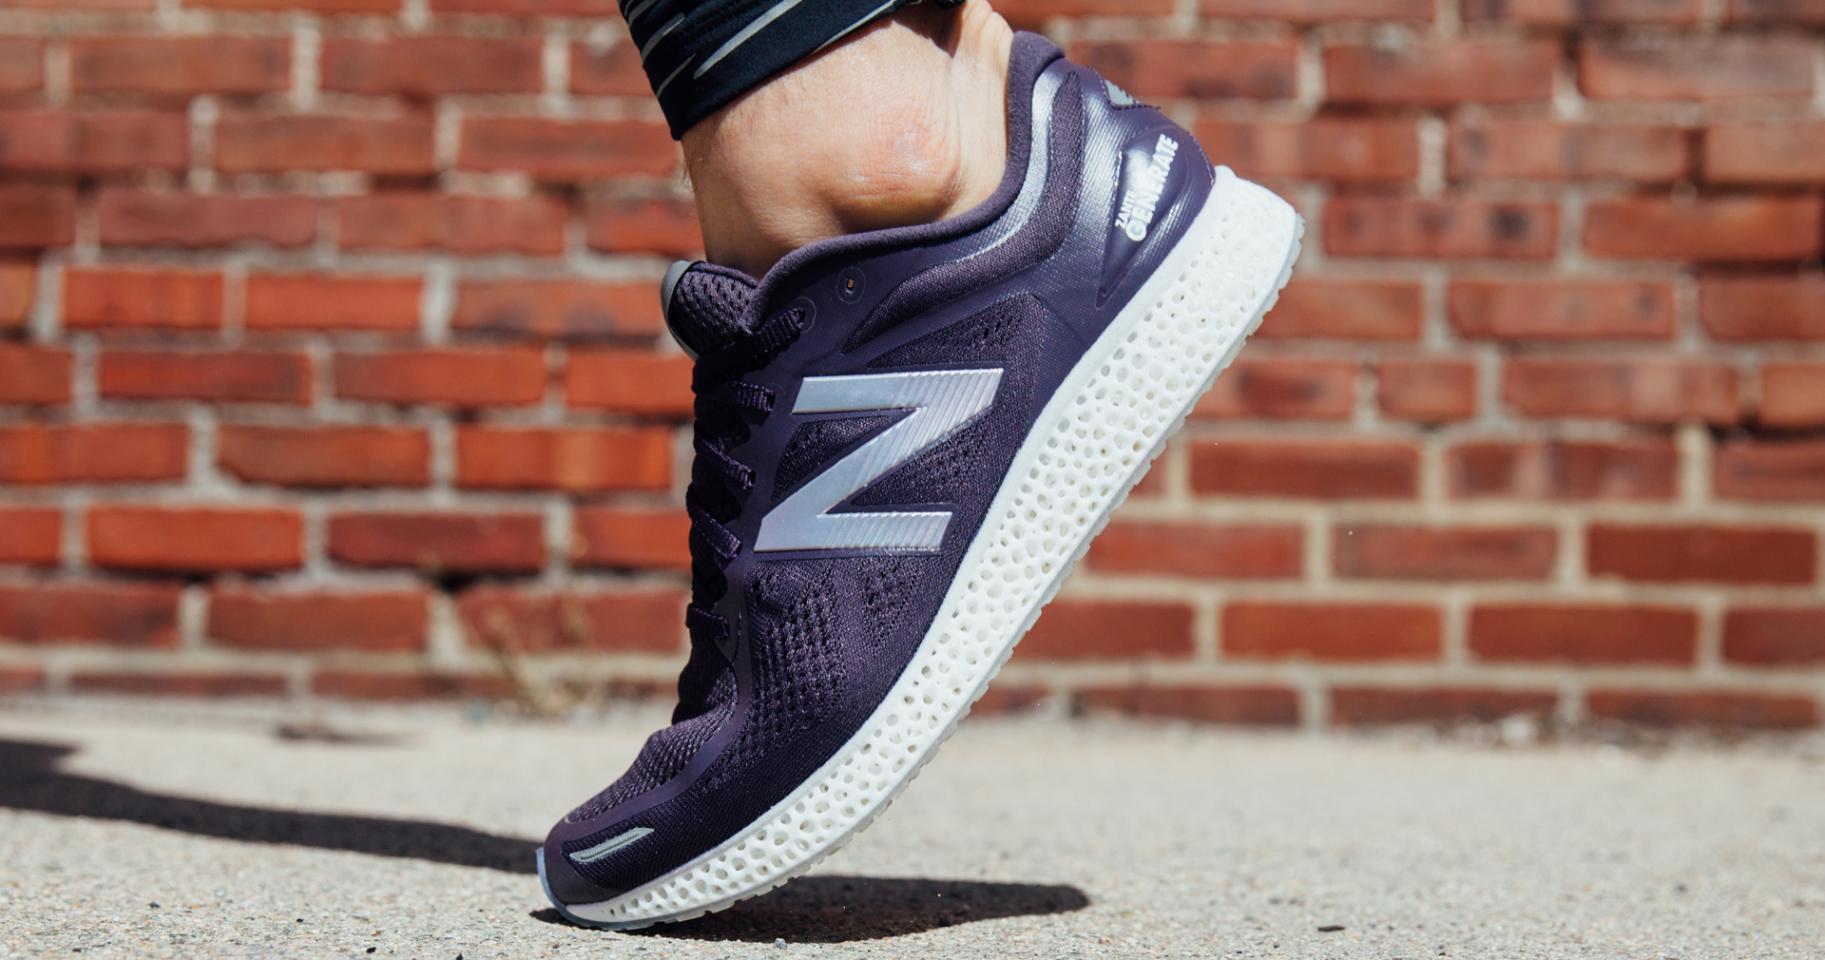 New Balance Installs Russell Finex Compact Sieve To 3D Print Footwear | All3DP